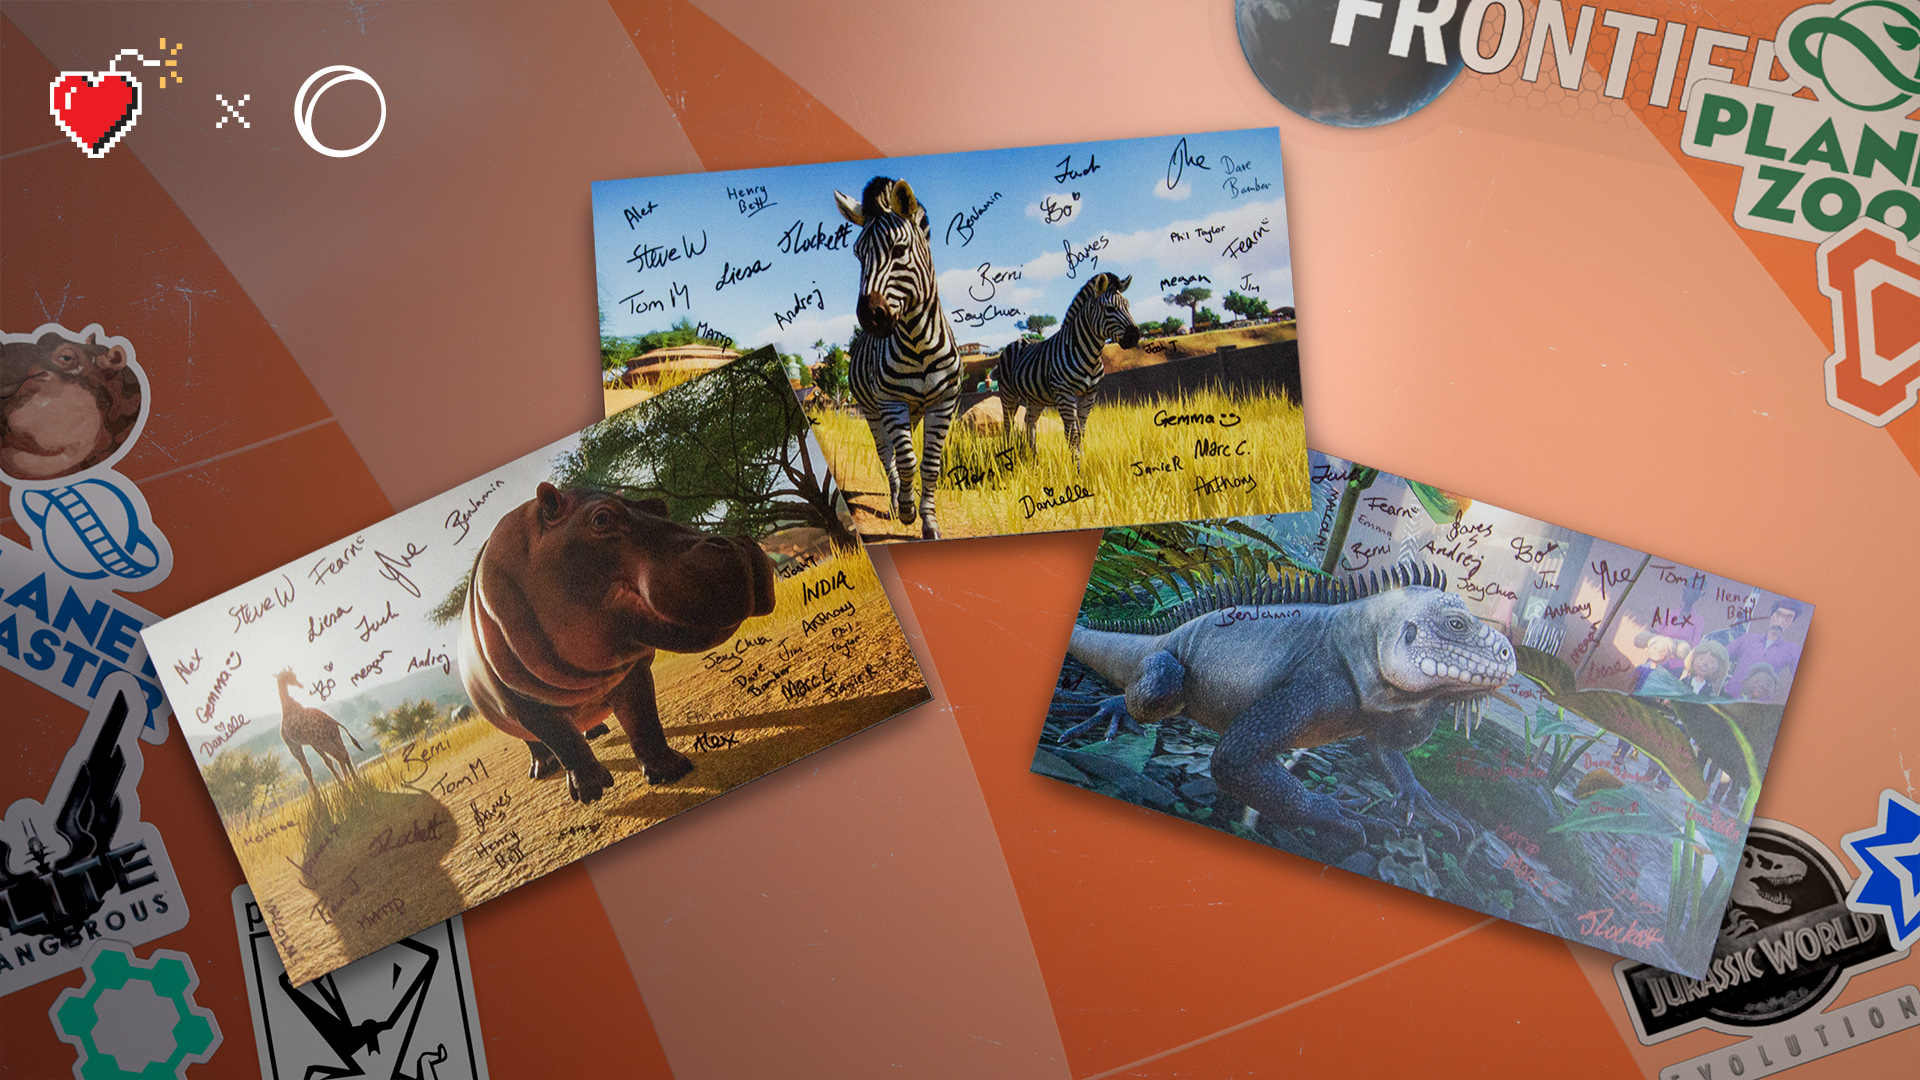 FR_charity_auction_PZ_signed_prints.jpg